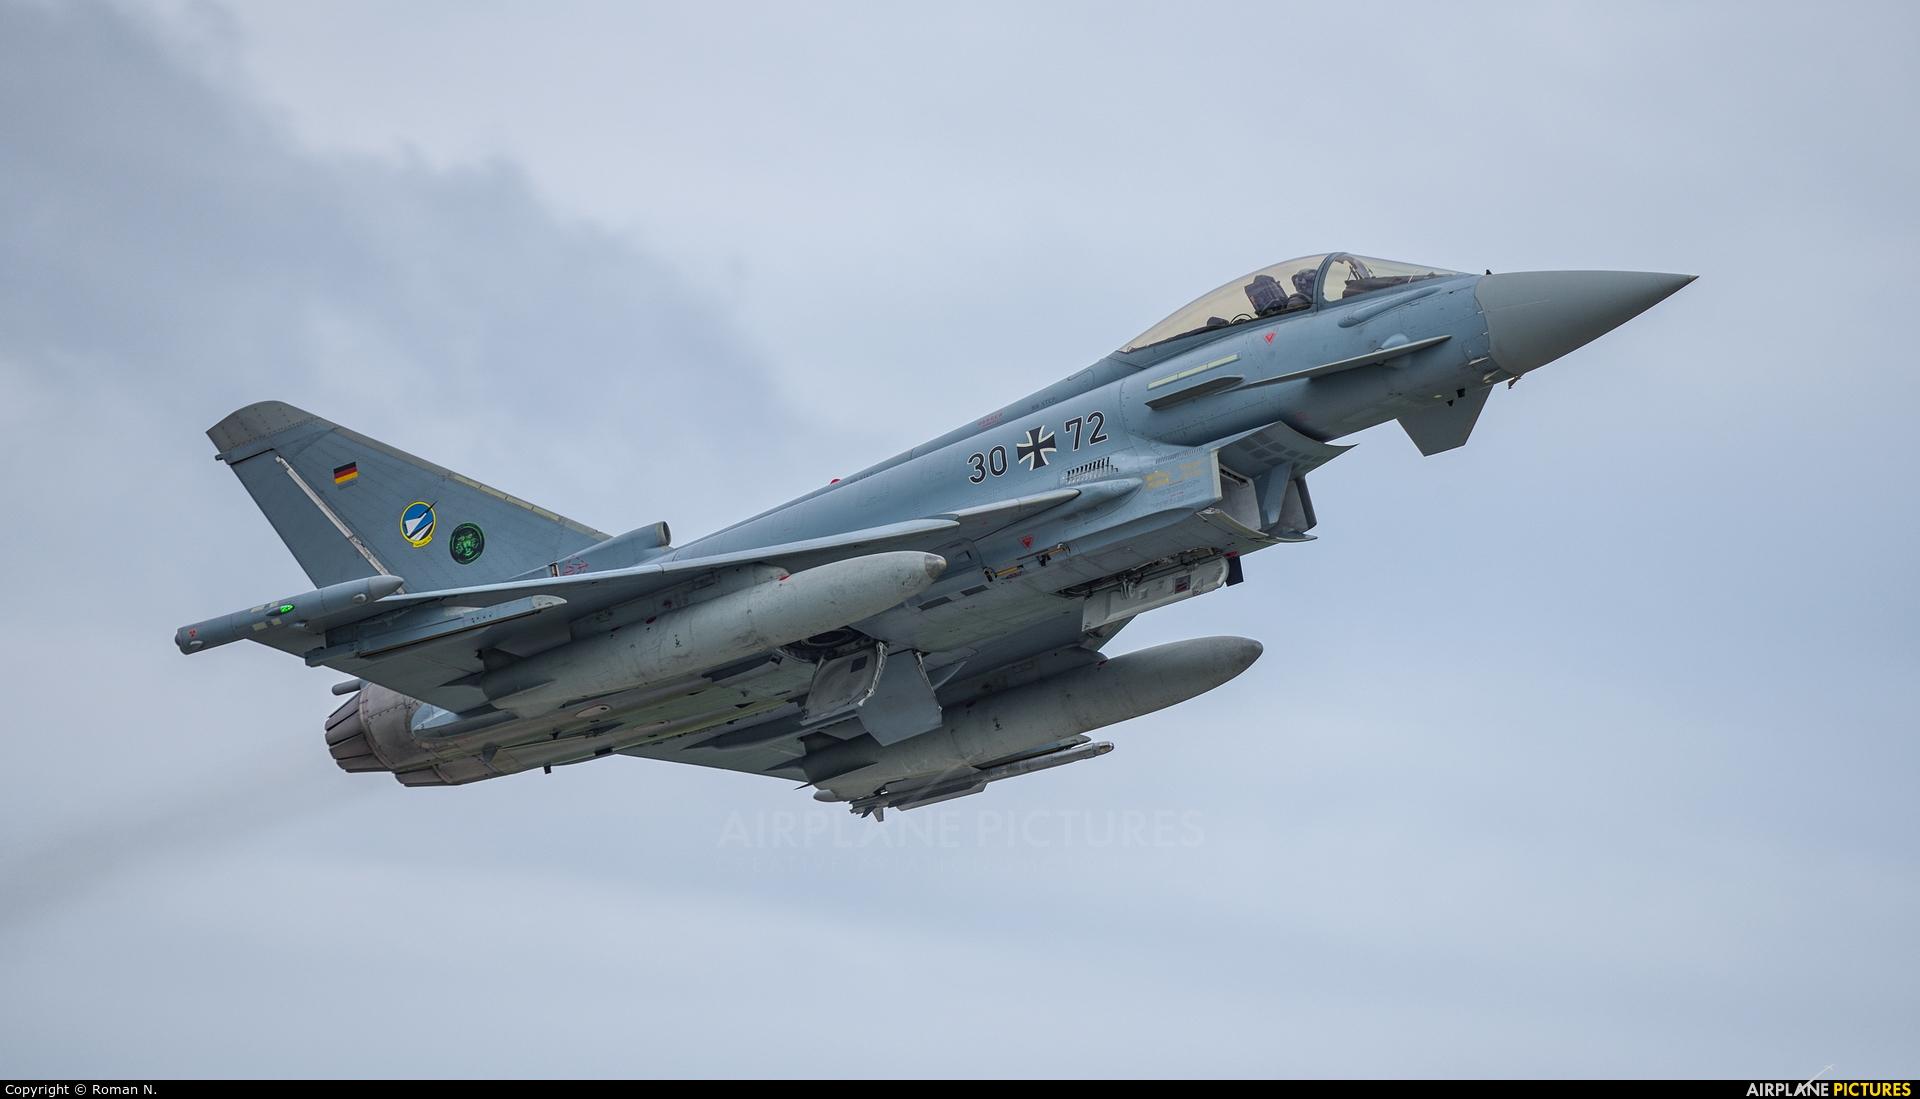 Germany - Air Force 30+72 aircraft at Poznań - Krzesiny